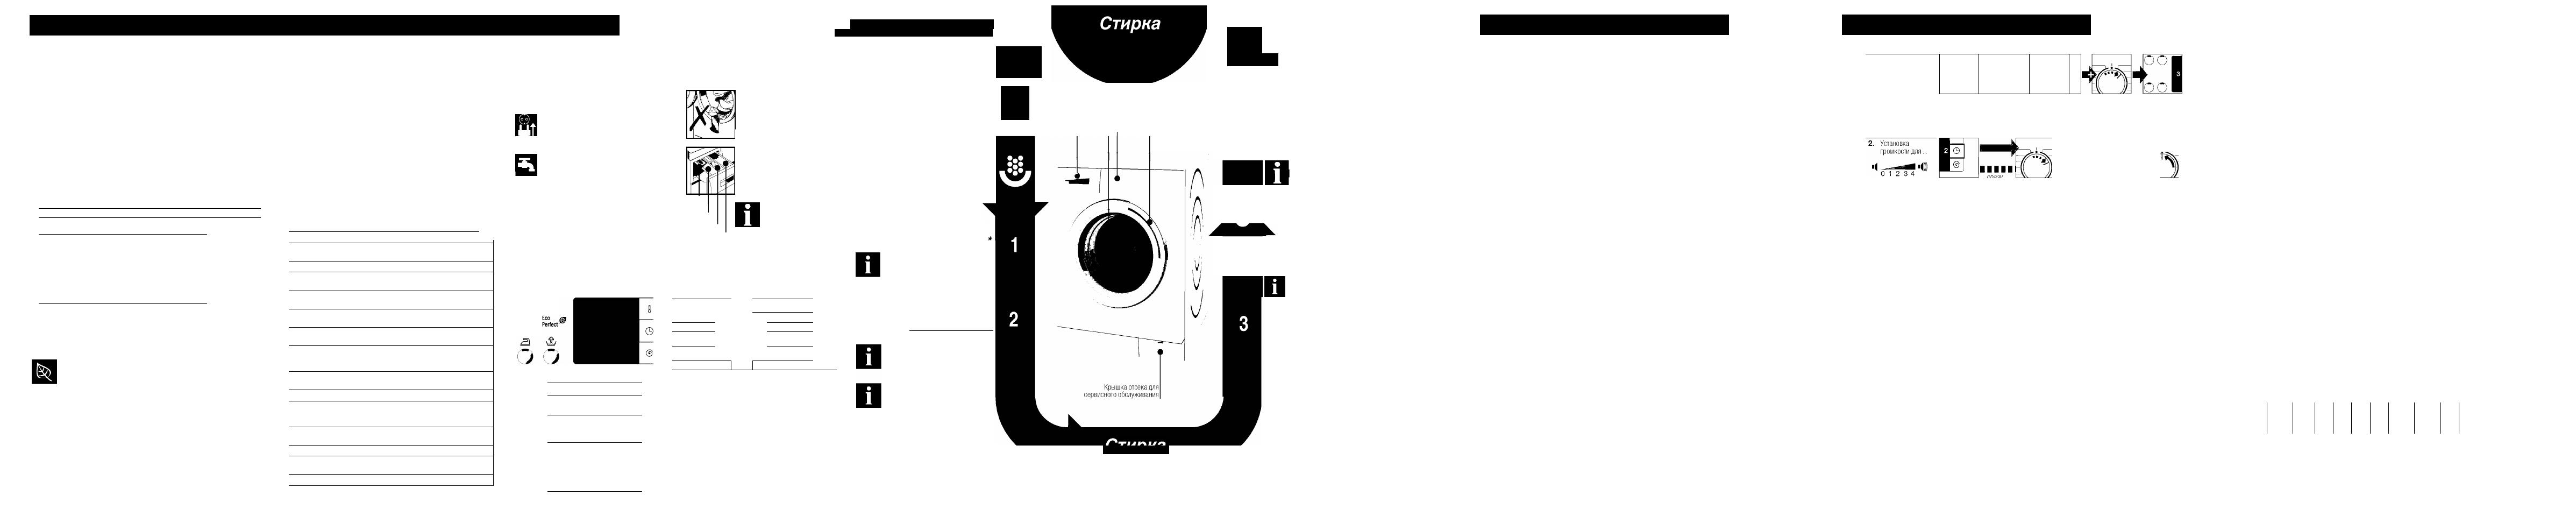 Bosch Logixx 7 Sensitive инструкция по эксплуатации - картинка 1